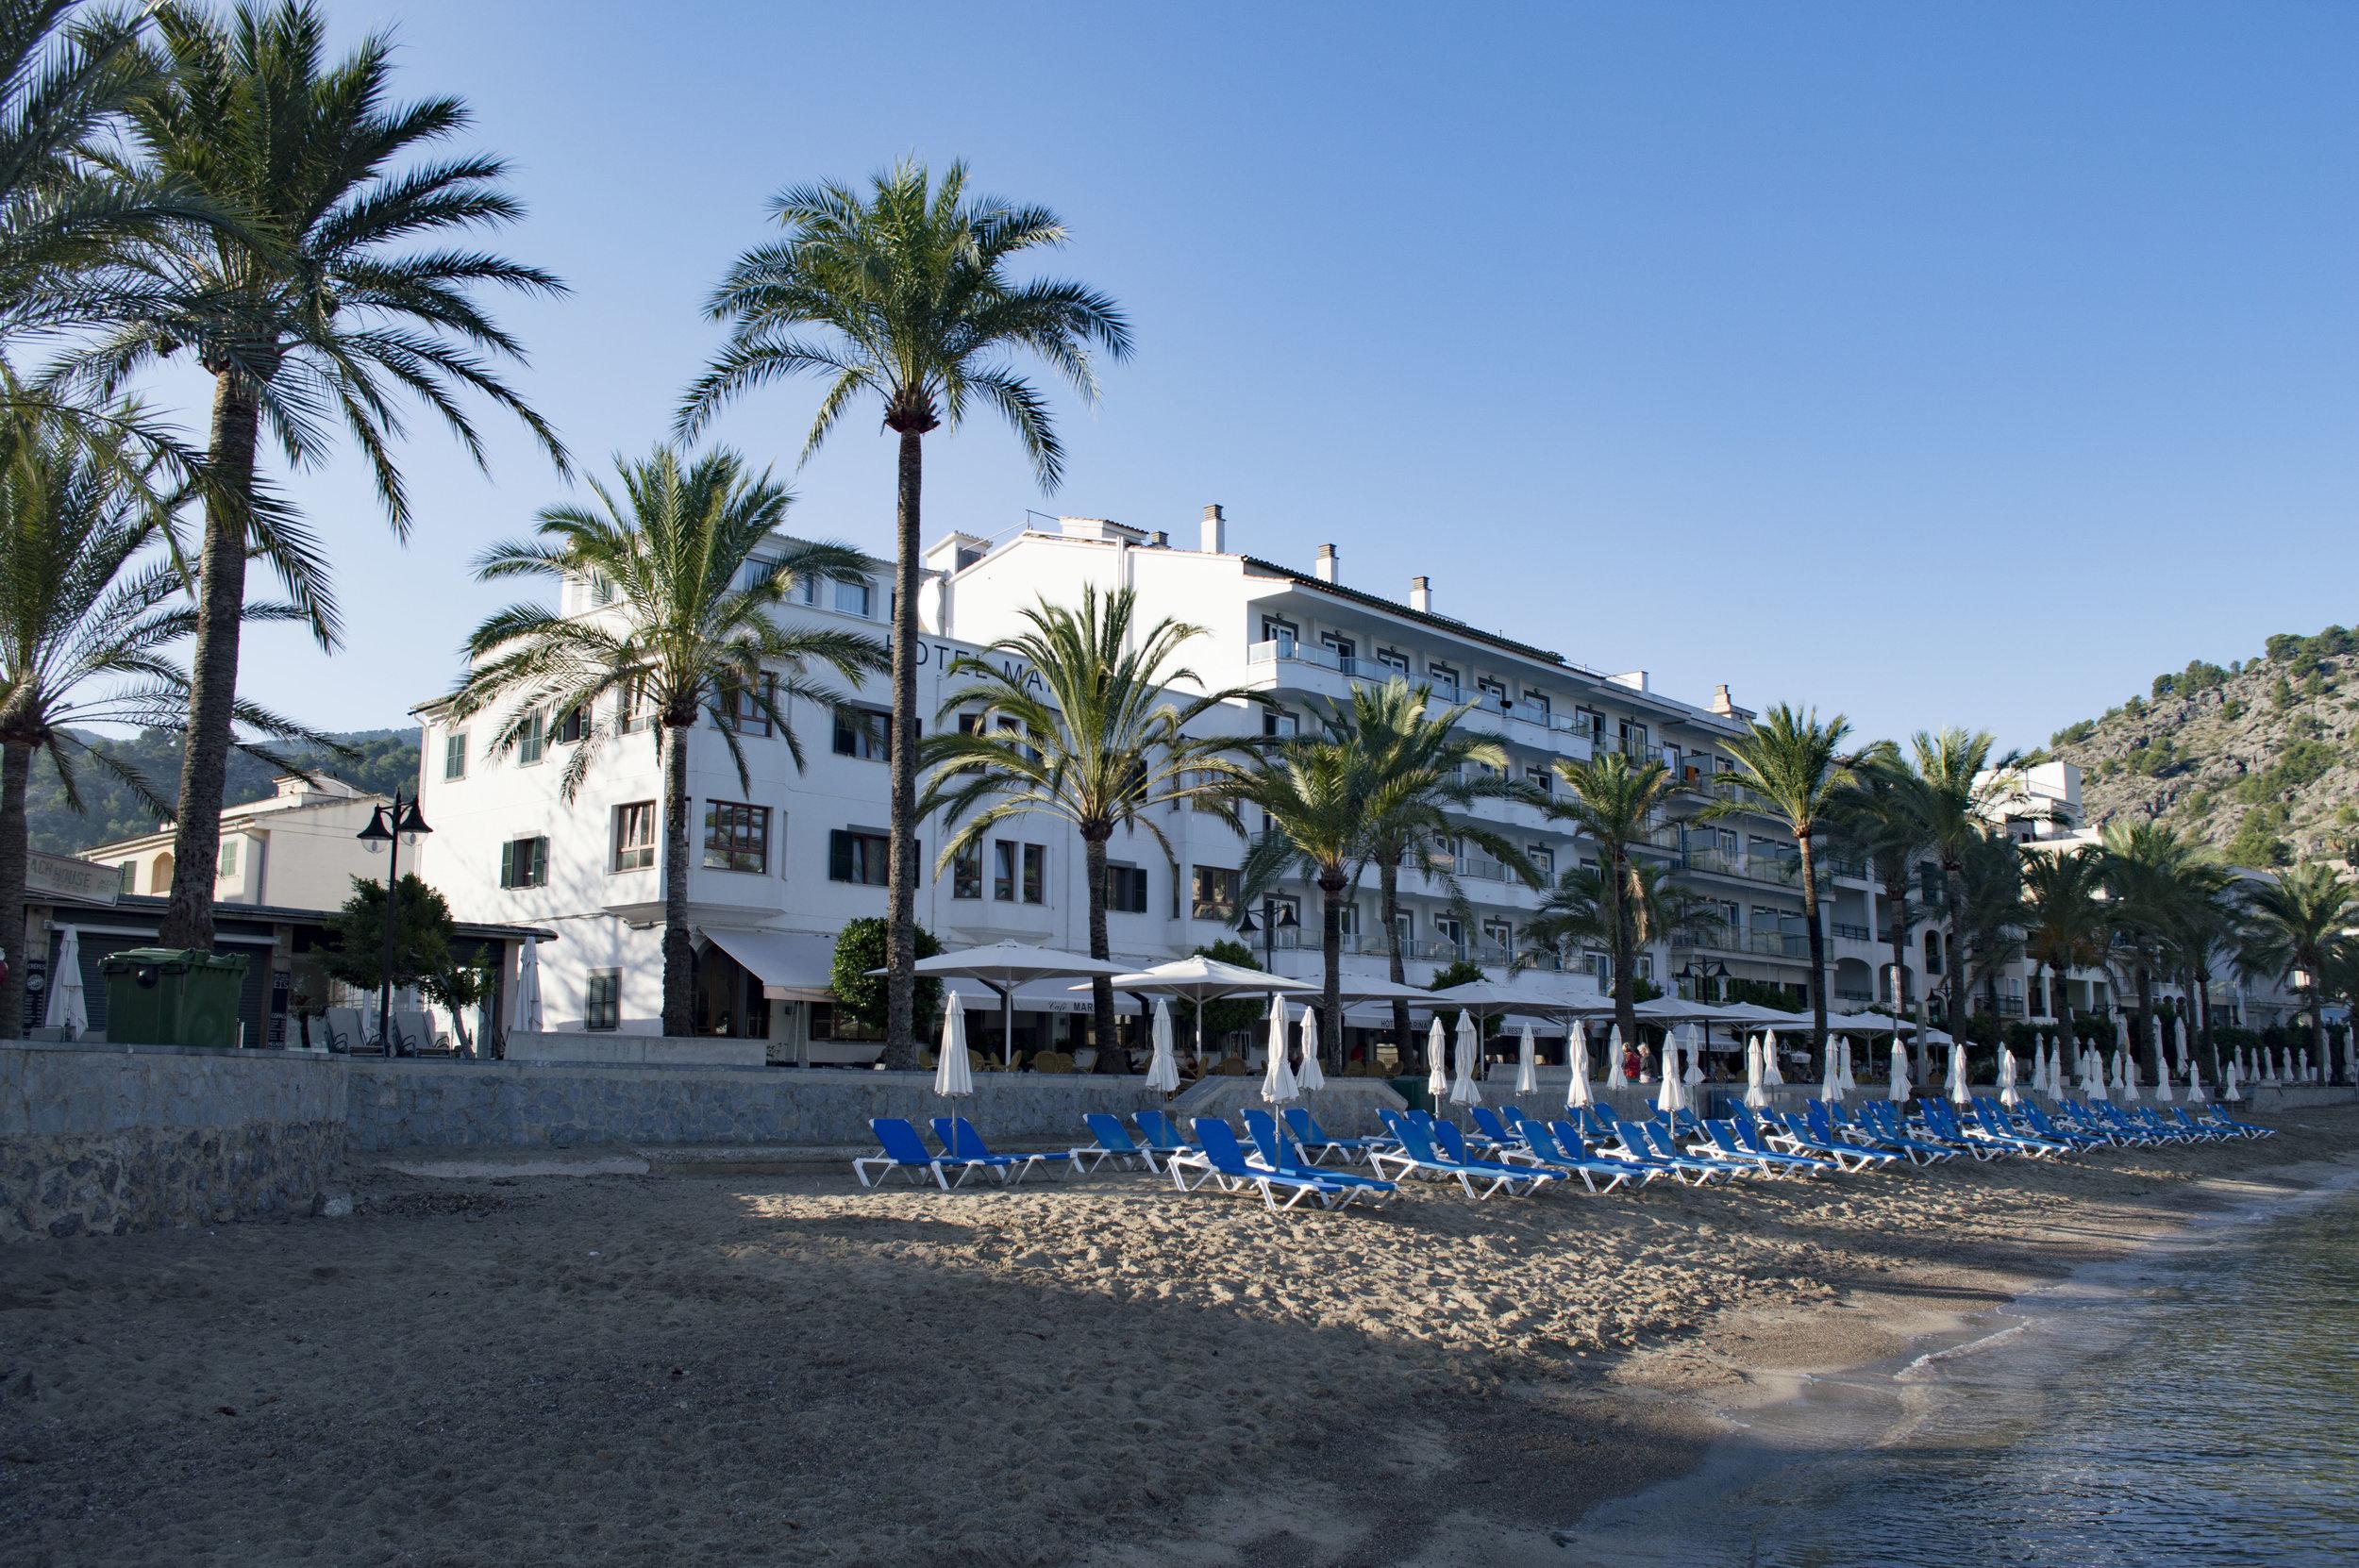 Hotel Beach.jpg